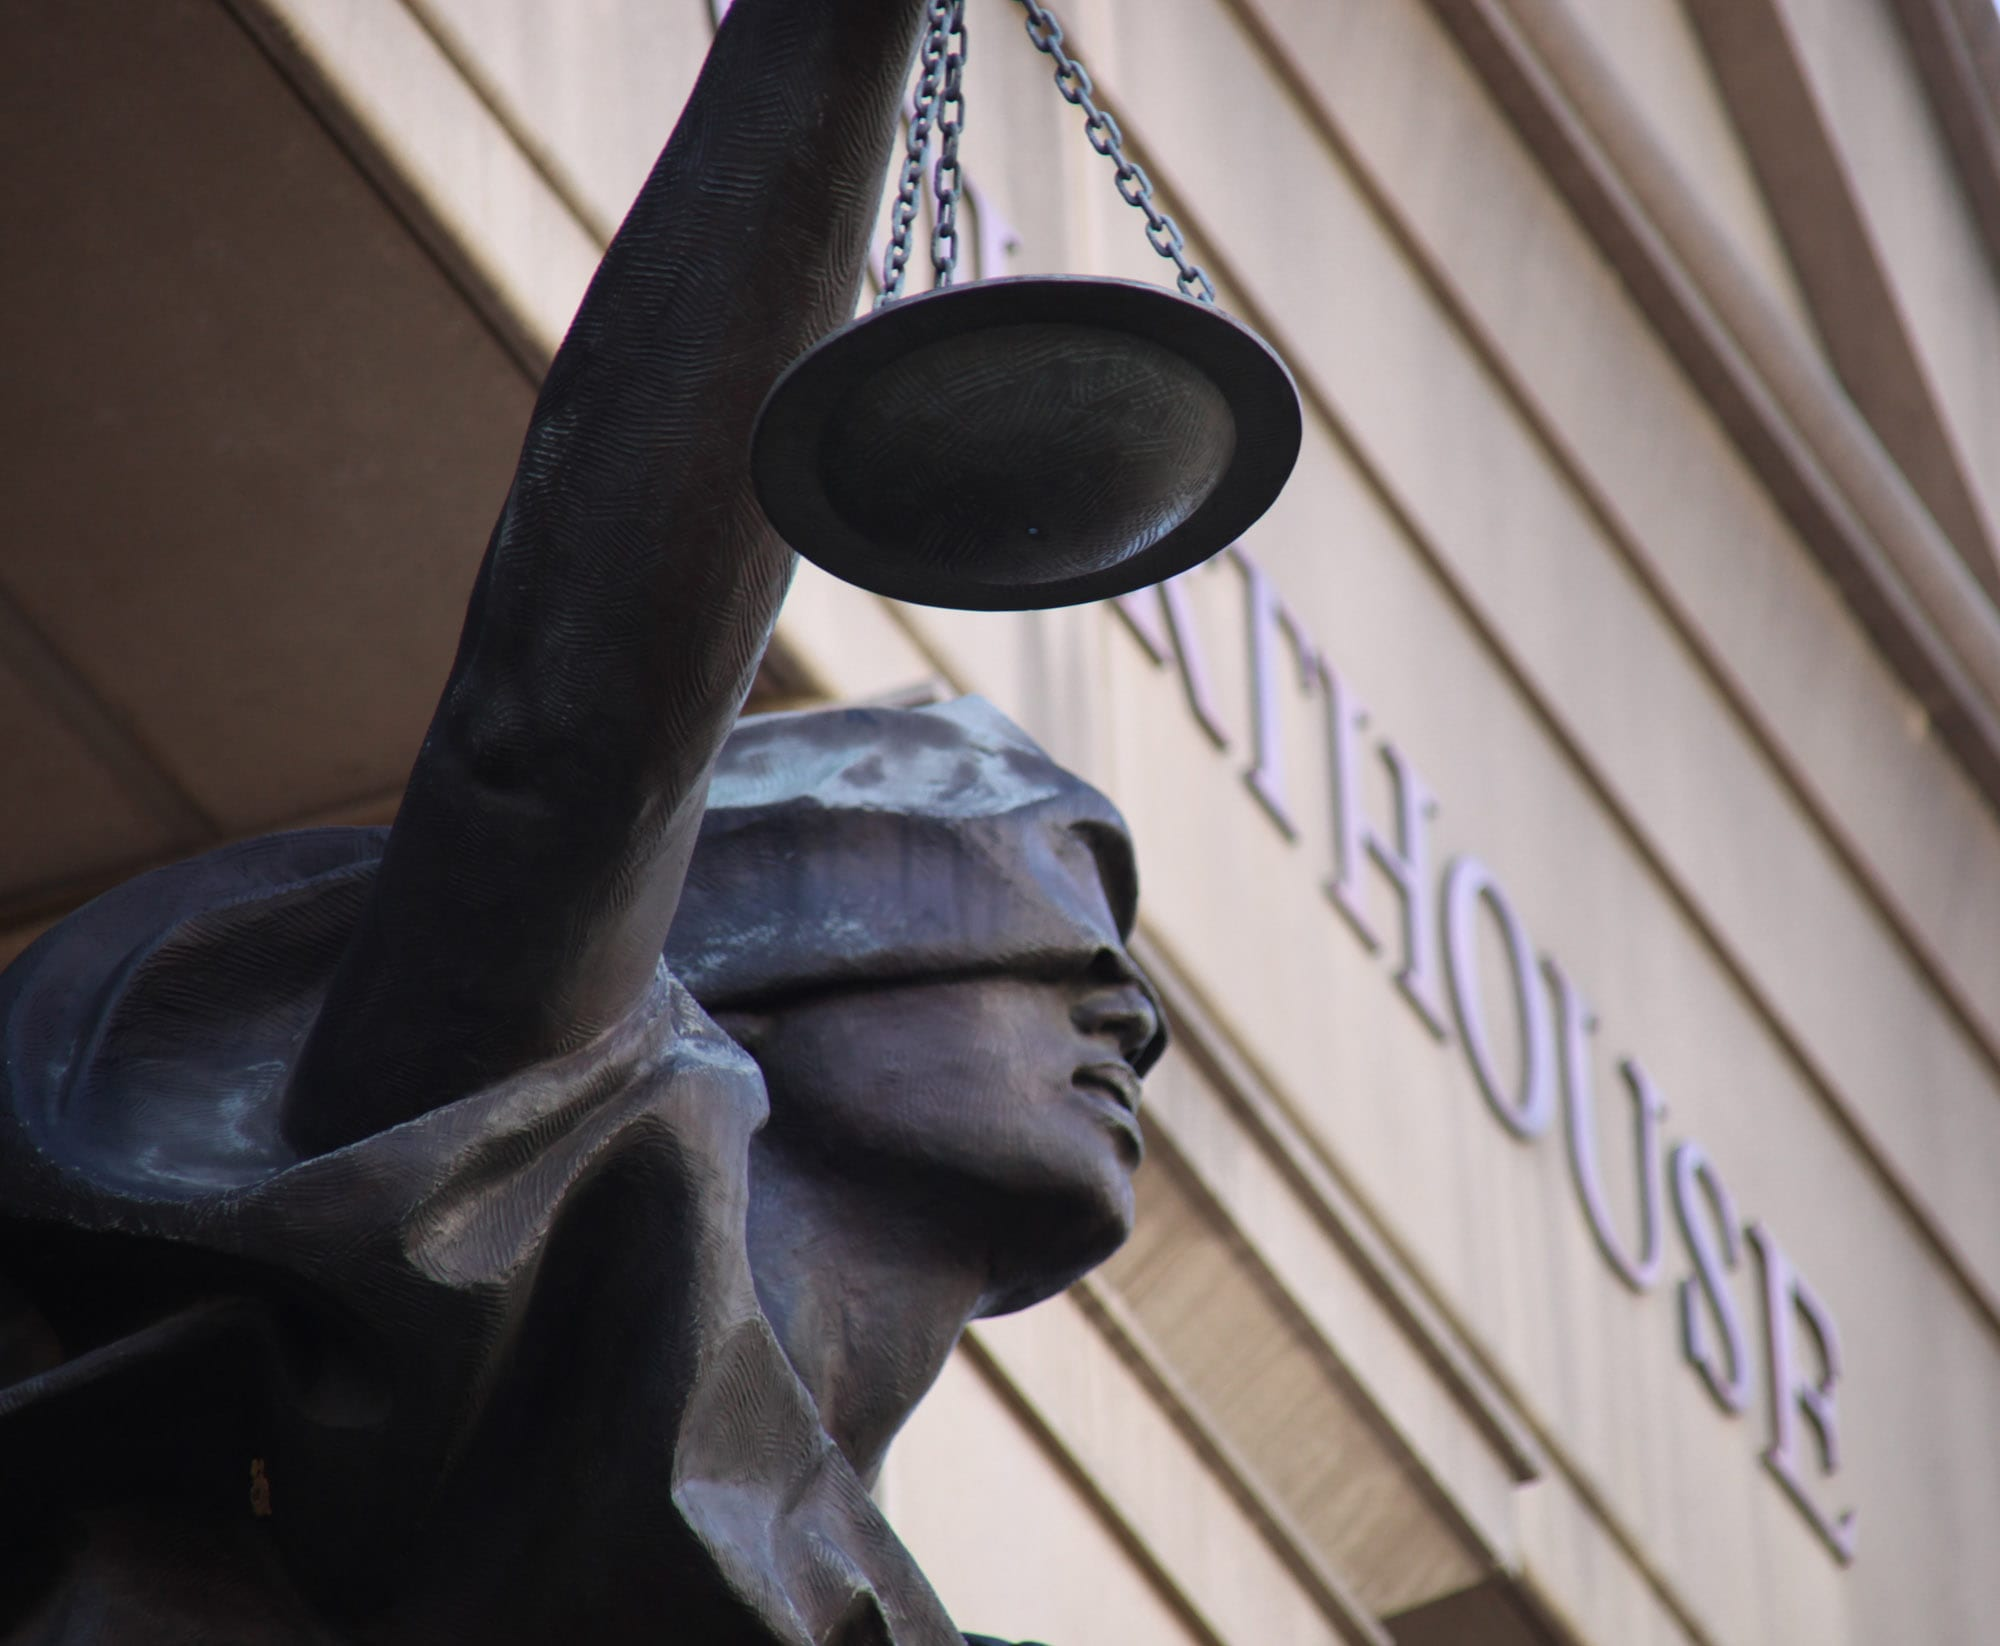 US appeals court rejects Harborside bid to end 280E